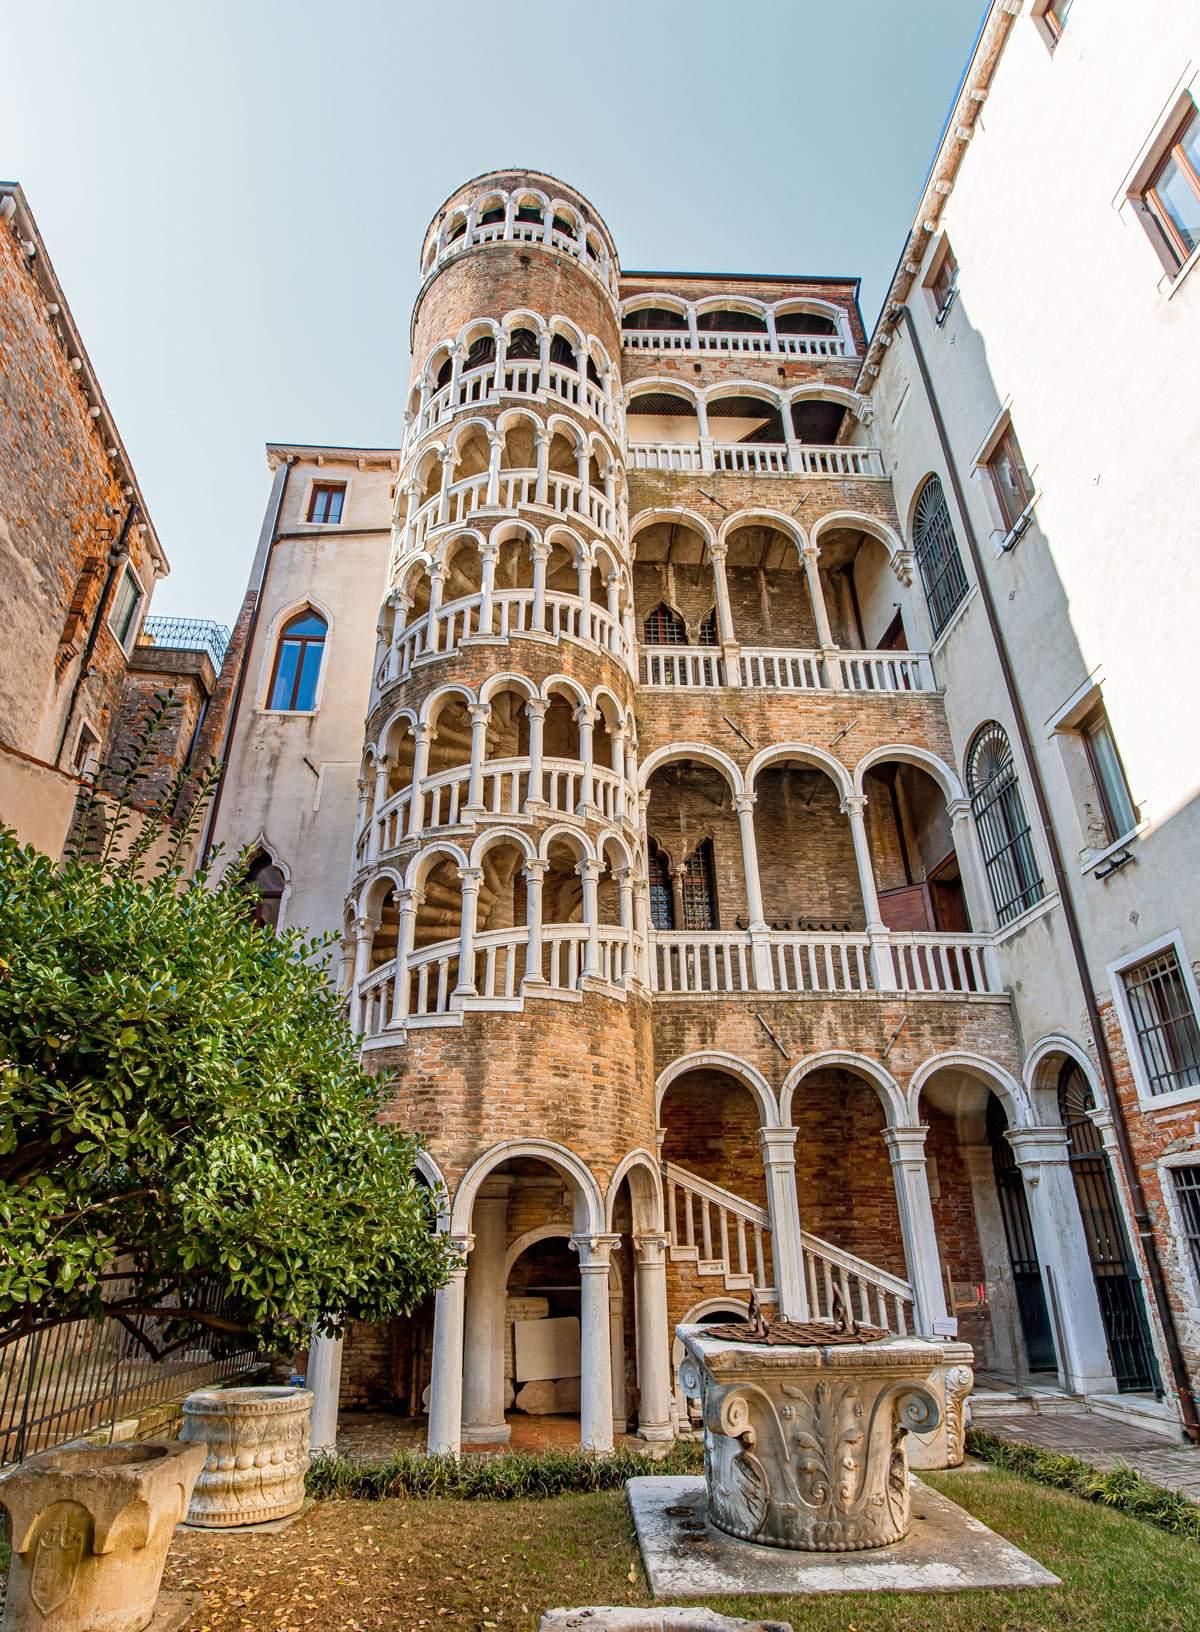 top things to do in Venice - Venice Instagram spots – Venice bucket list - kelseyinlondon - kelsey heinrichs - venice gondola ride - venice grand canal